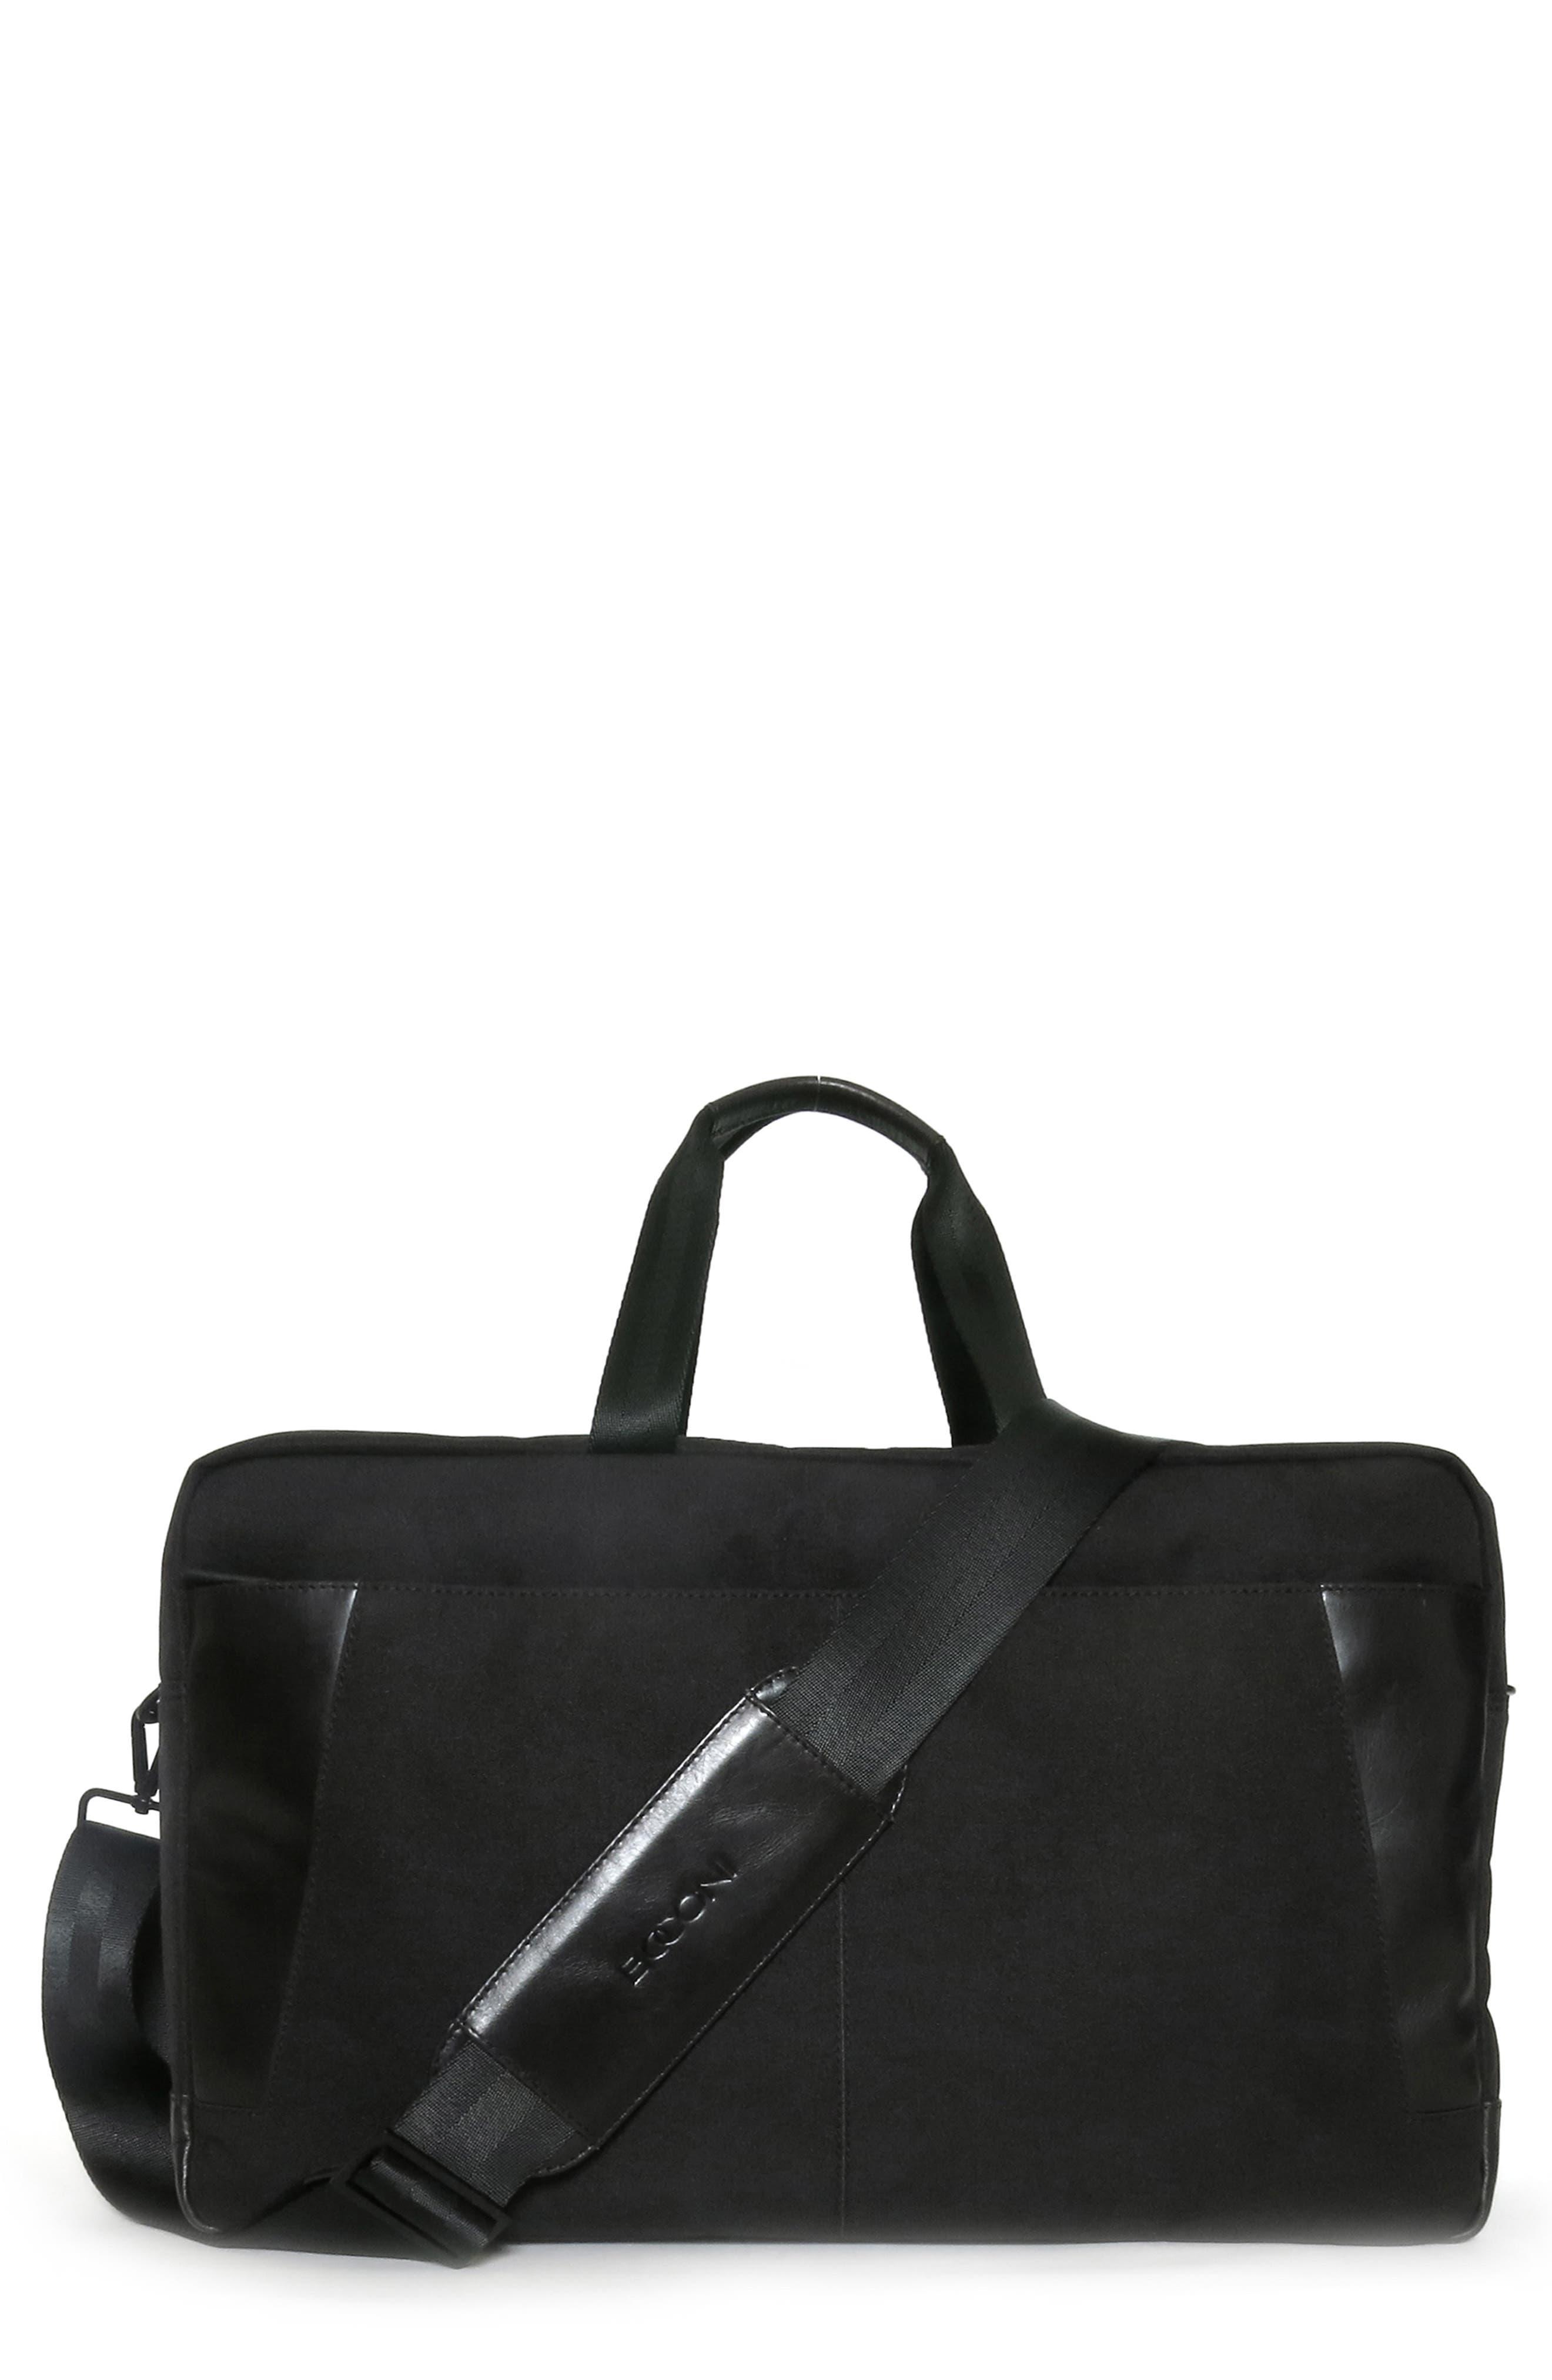 Collins Canvas Duffle Bag